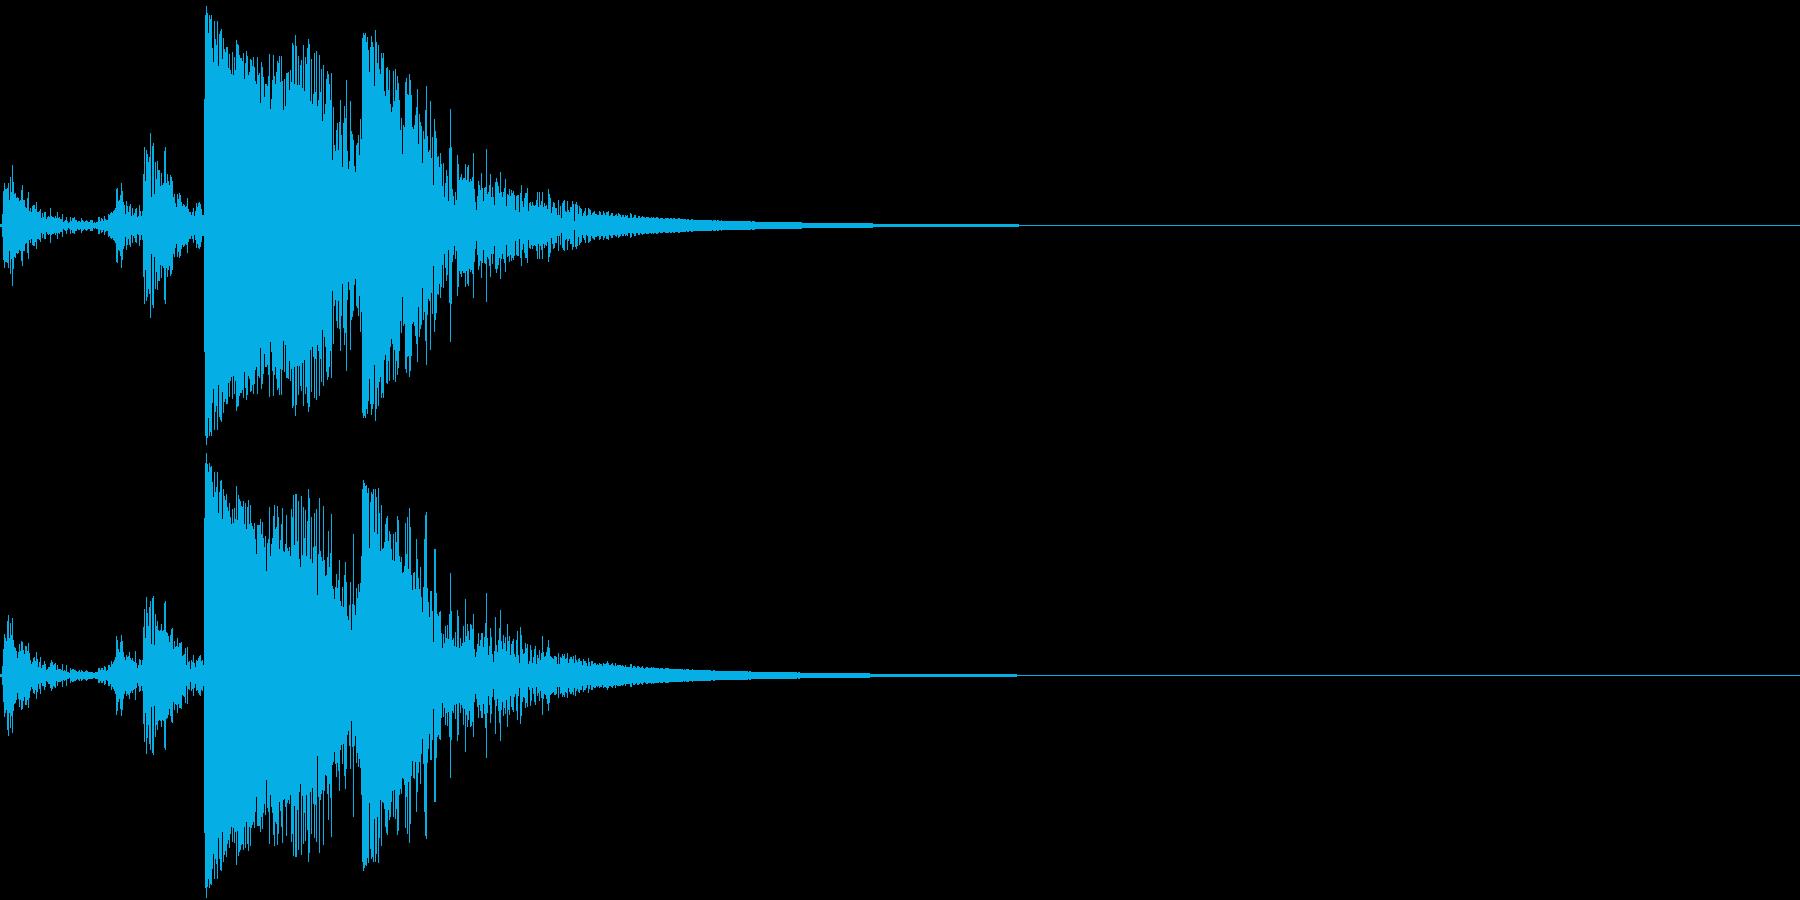 Metal 金属製の道具を置く音の再生済みの波形